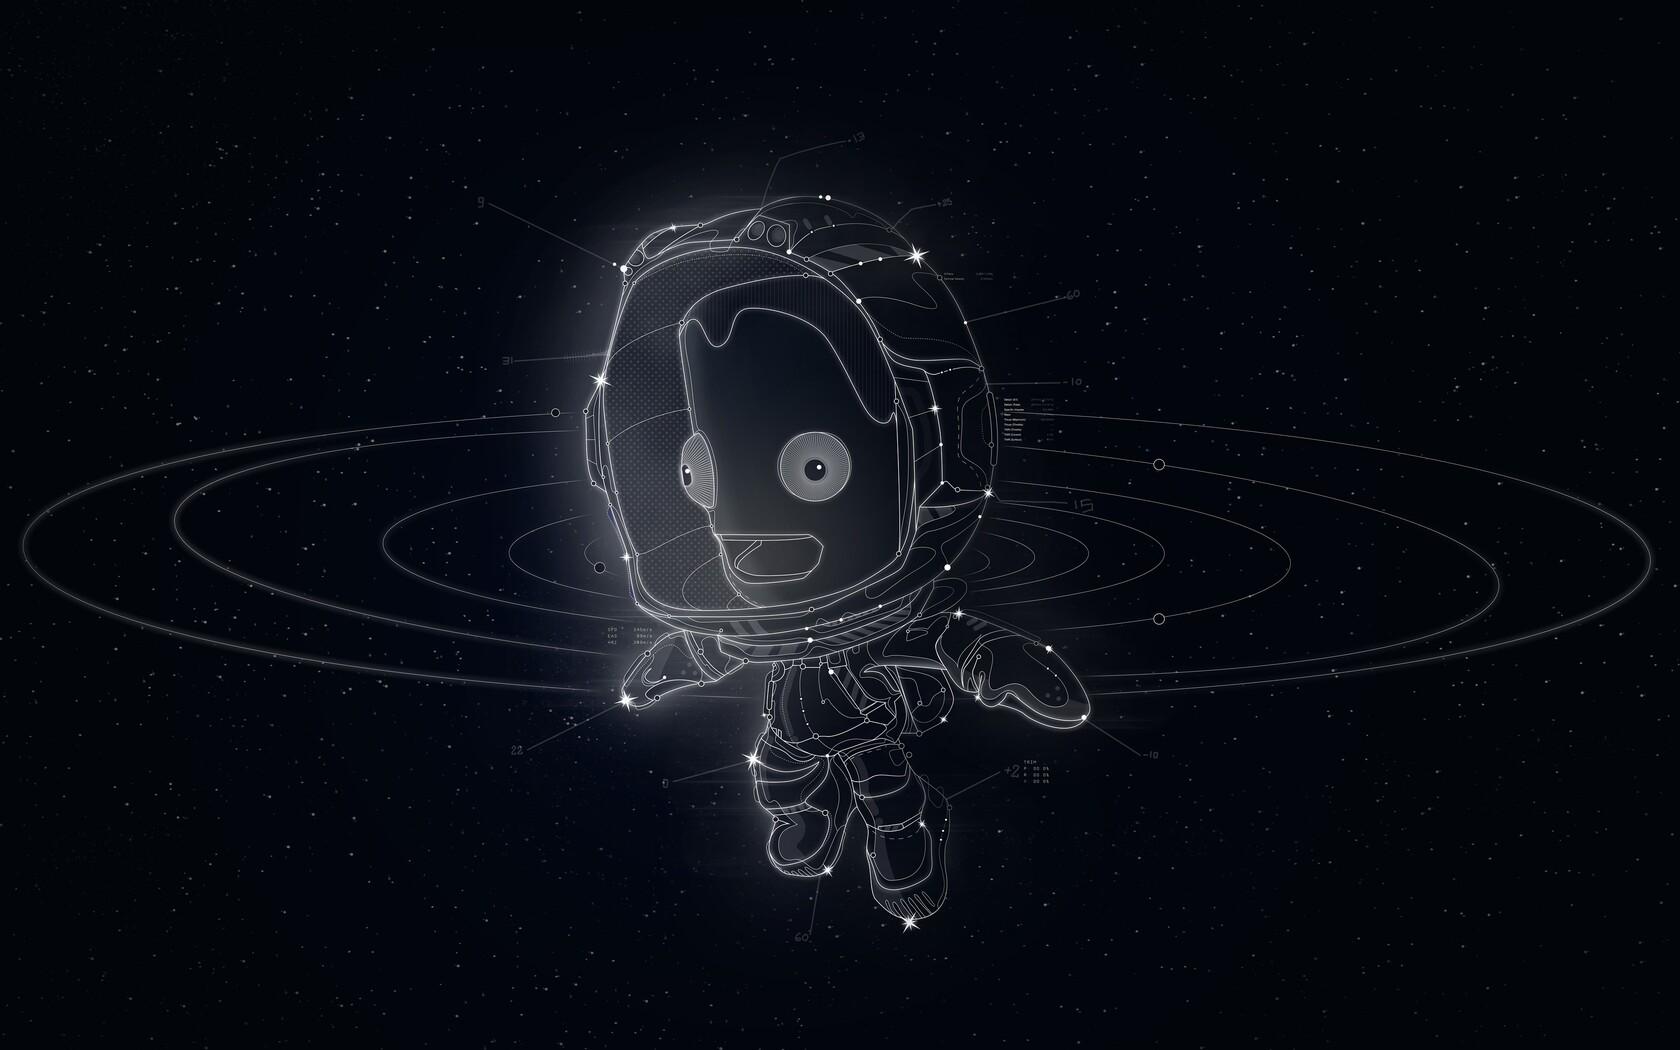 1680x1050 Kerbal Space Program 1680x1050 Resolution Hd 4k